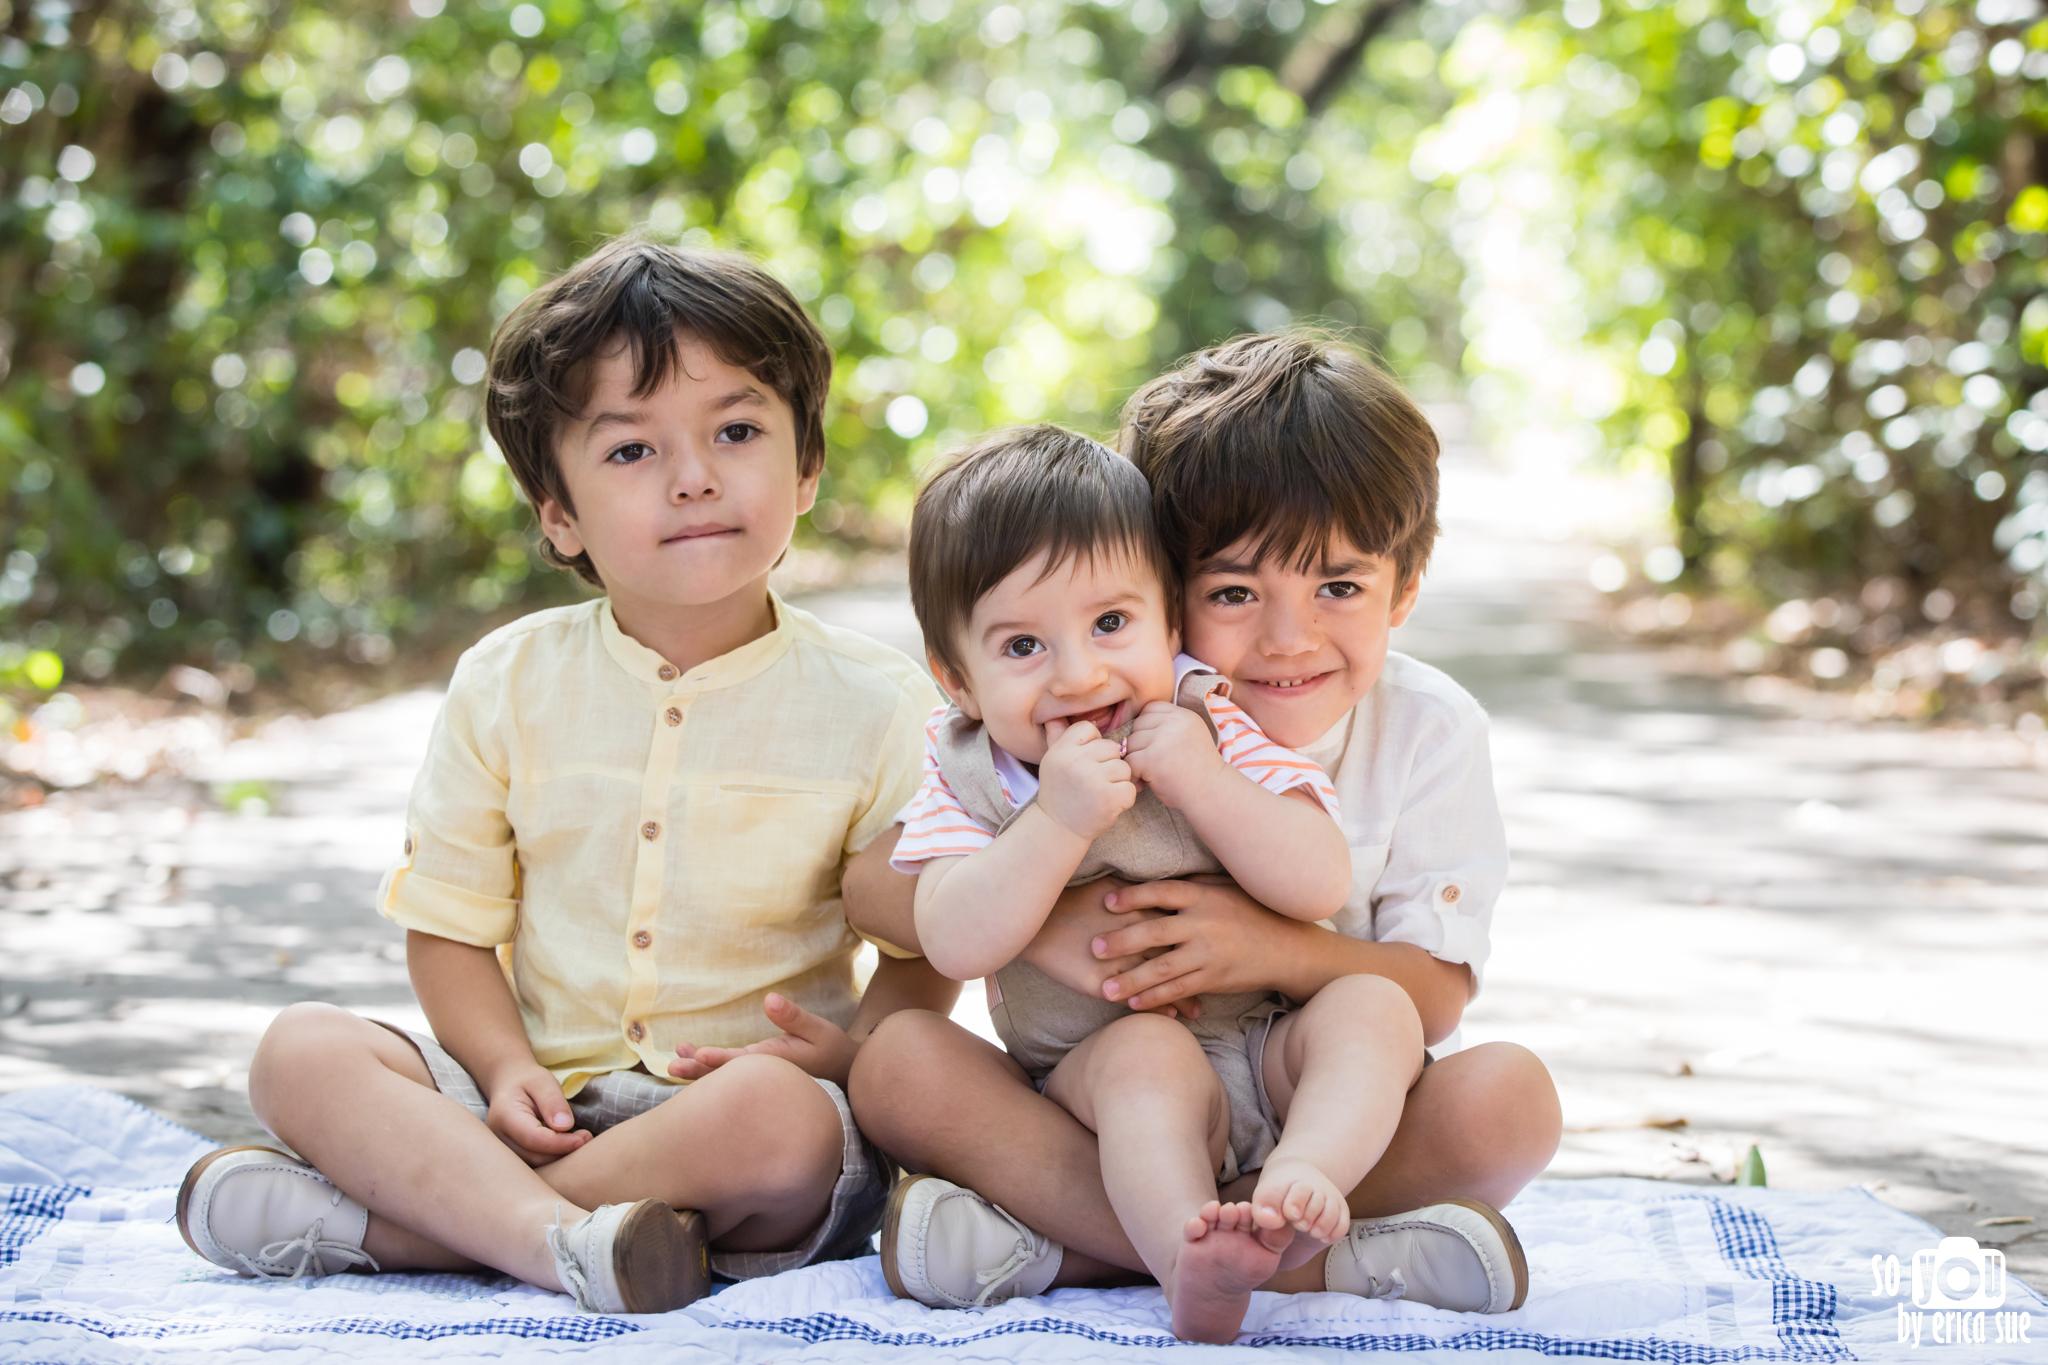 coconut-grove-lifestyle-family-photography-8406.jpg